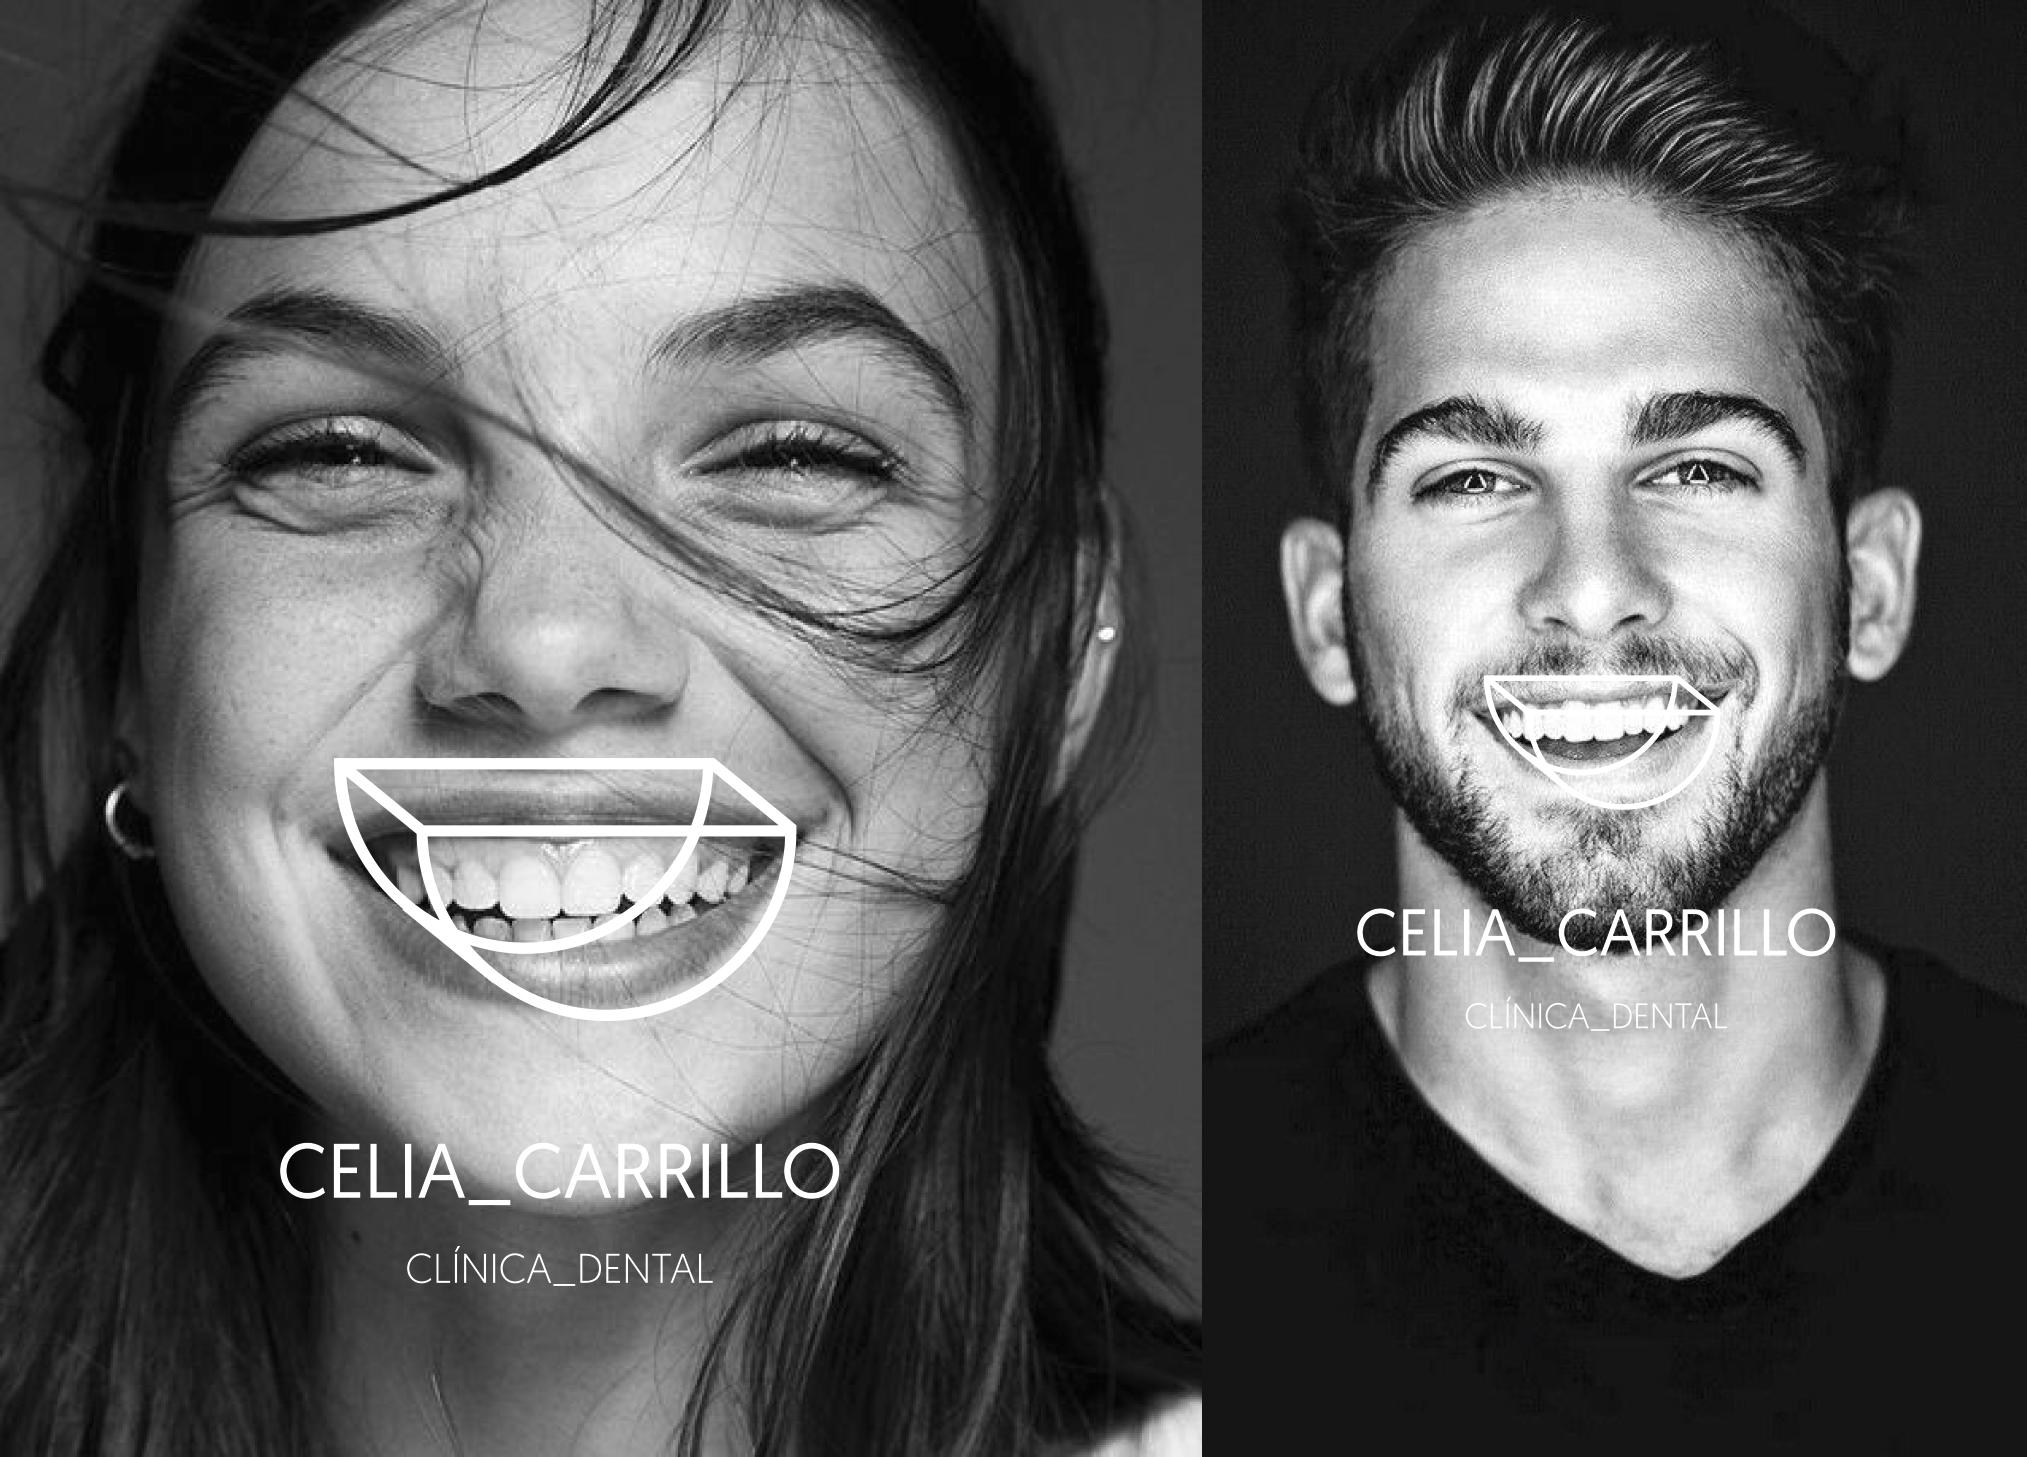 CELIA_CARRILLO CLÍNICA_DENTAL by CREATIAS ESTUDIO - Creative Work - $i